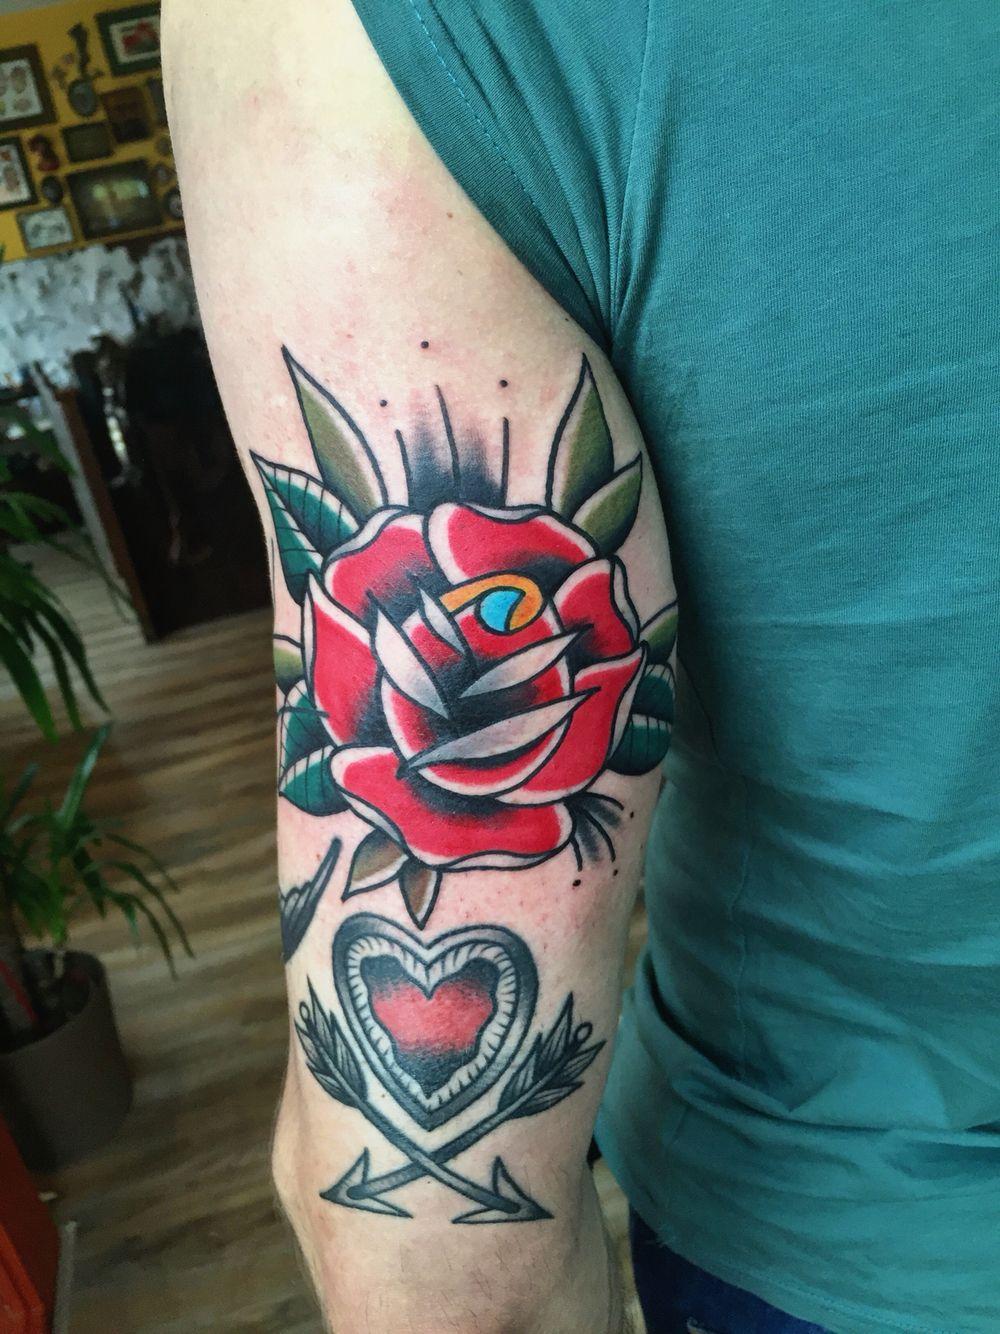 Rose tattoo by Bram Elstak